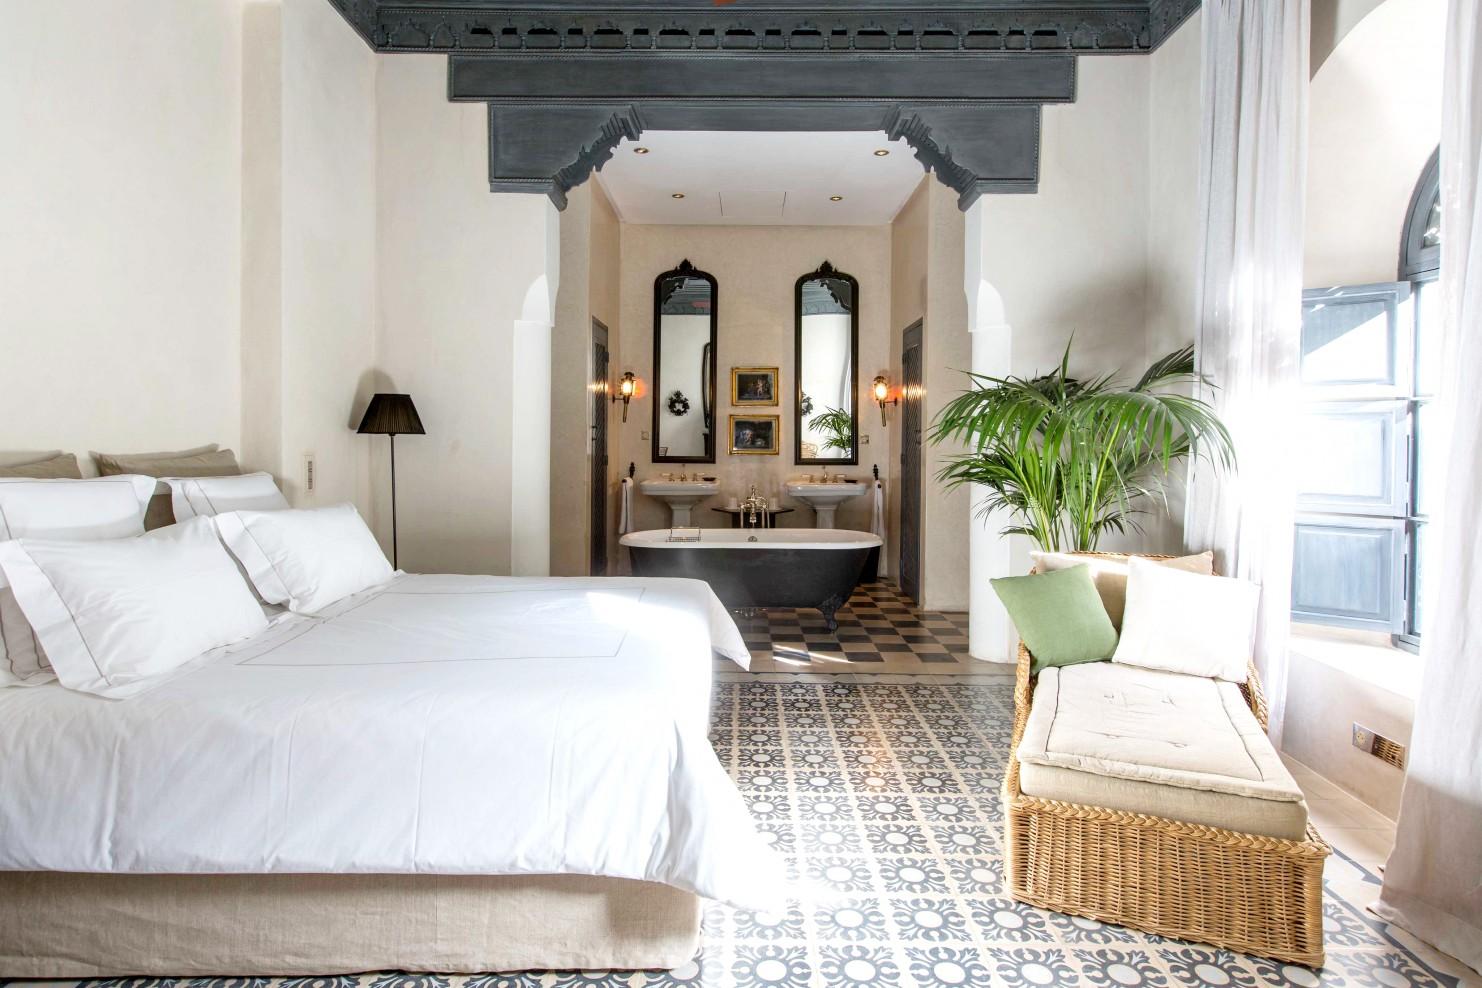 Riad de Tarabel hotel - Marrakech - Smith Hotels